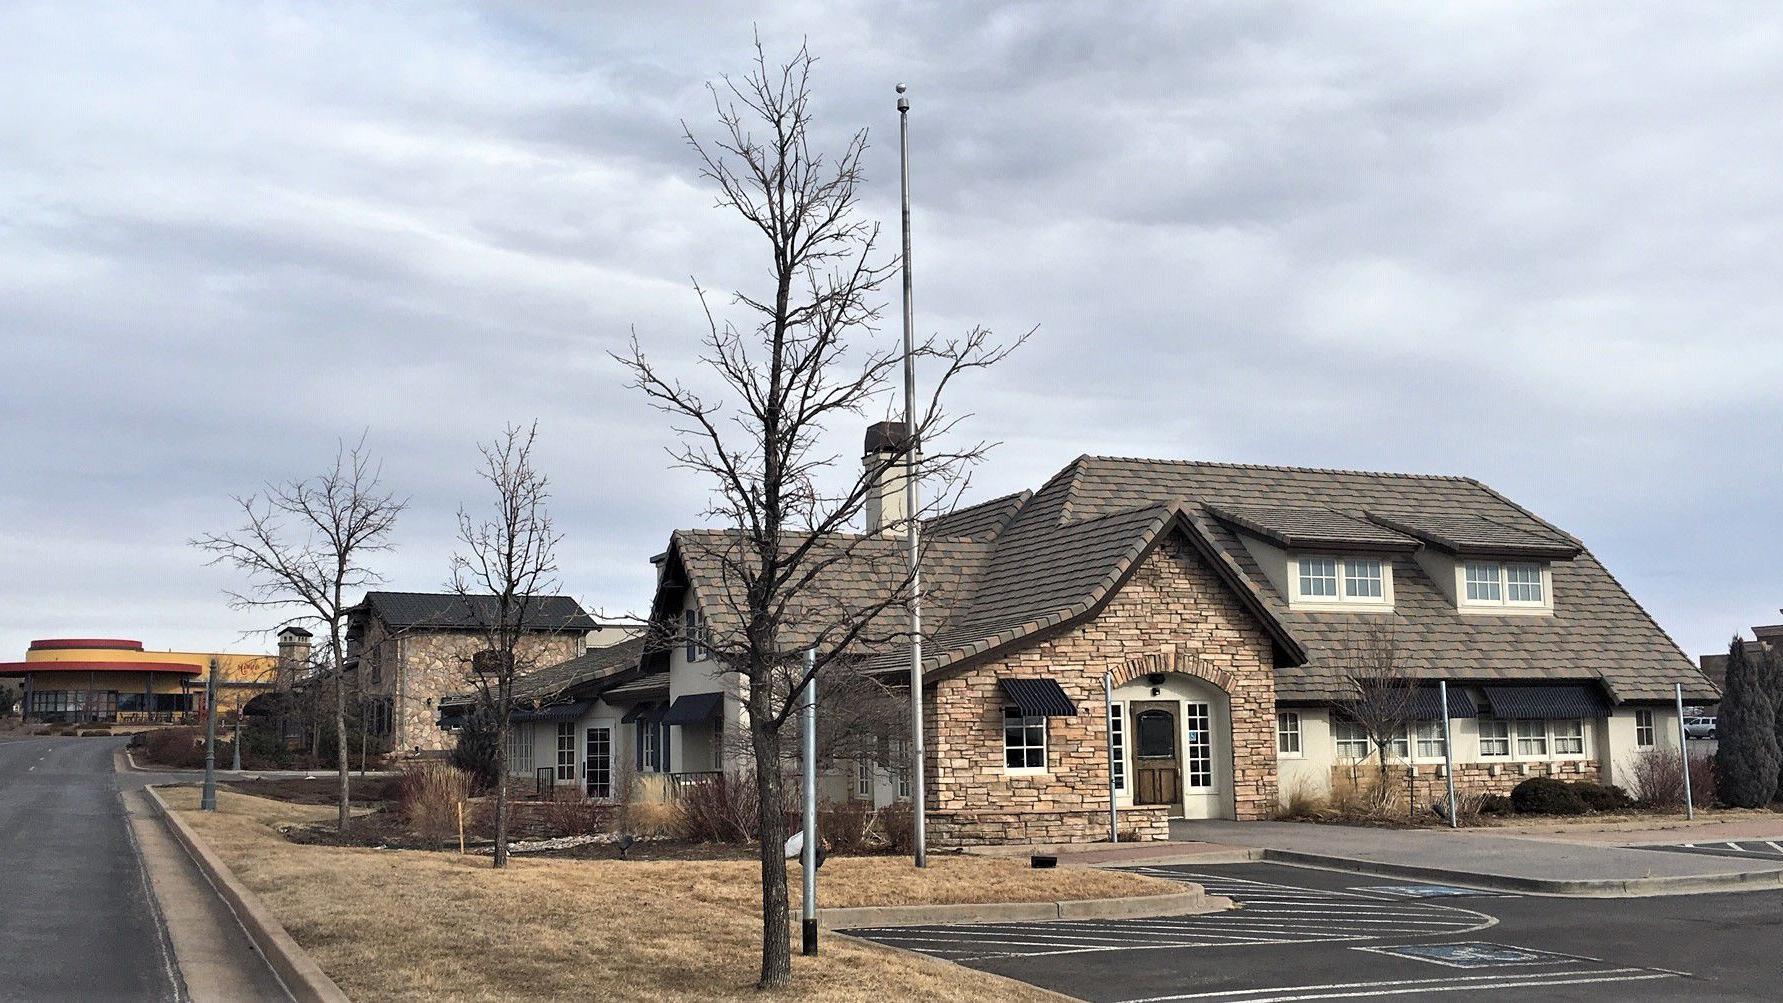 So Long Mimi S Hello Buffalo Wild Wings Sports Bar Chain Plans Third Colorado Springs Location Business Gazette Com